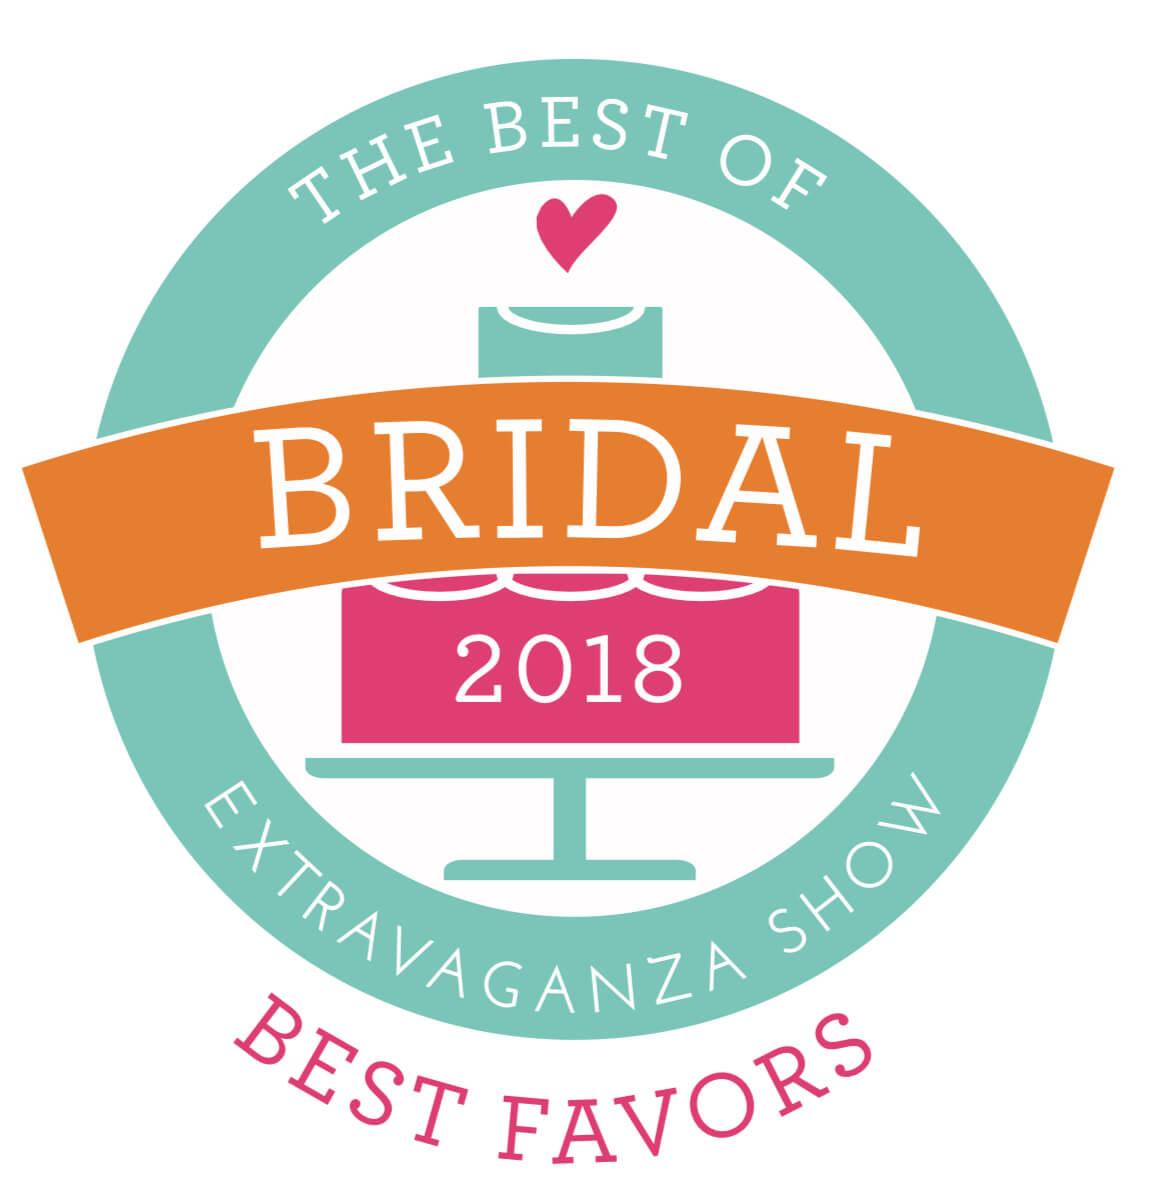 Succulent Bar  winner at Houston Bridal Extravaganza